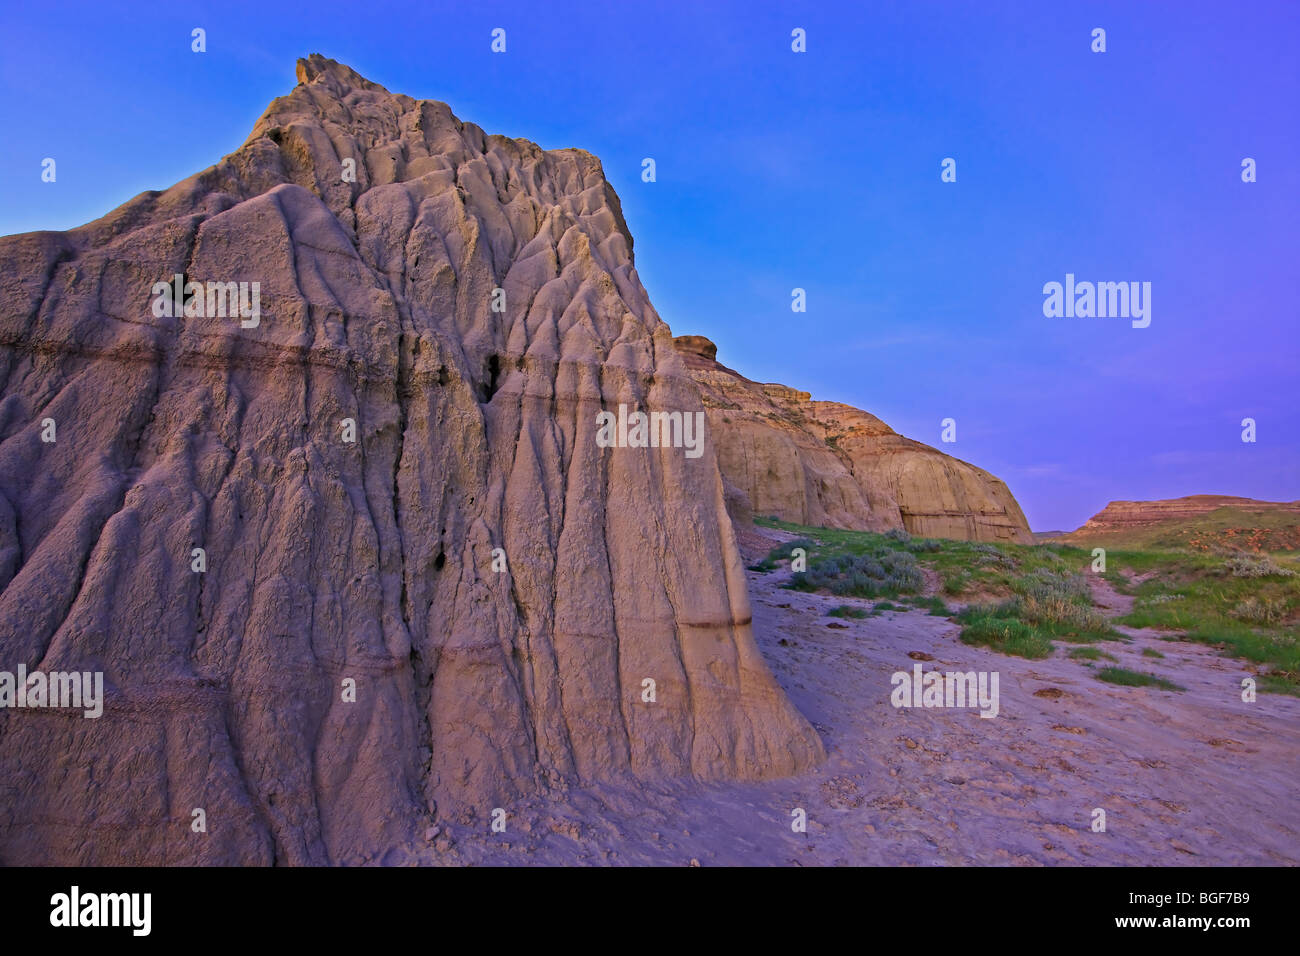 Formations of Castle Butte during dusk in Big Muddy Badlands, Southern Saskatchewan, Canada. - Stock Image